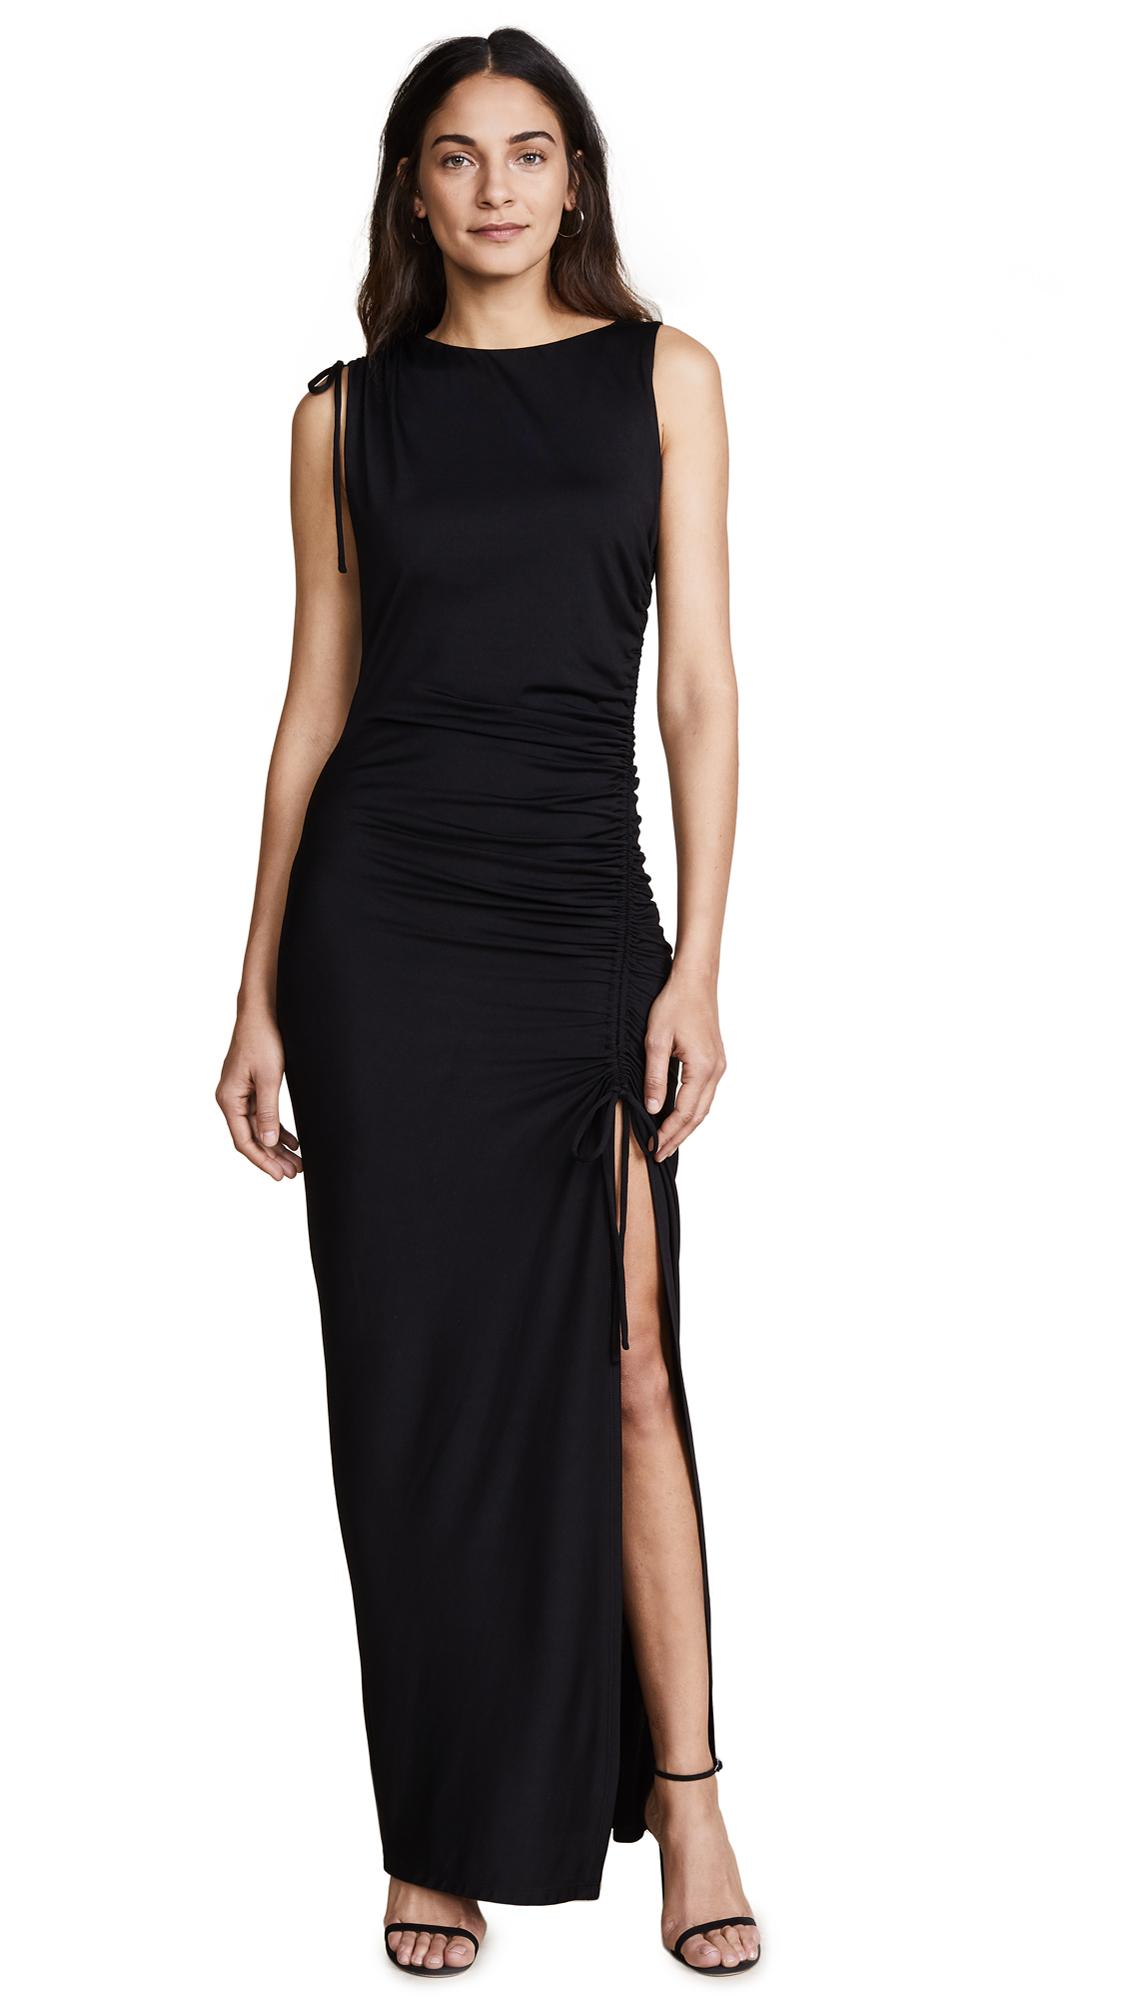 Susana Monaco Deana Ruched Dress